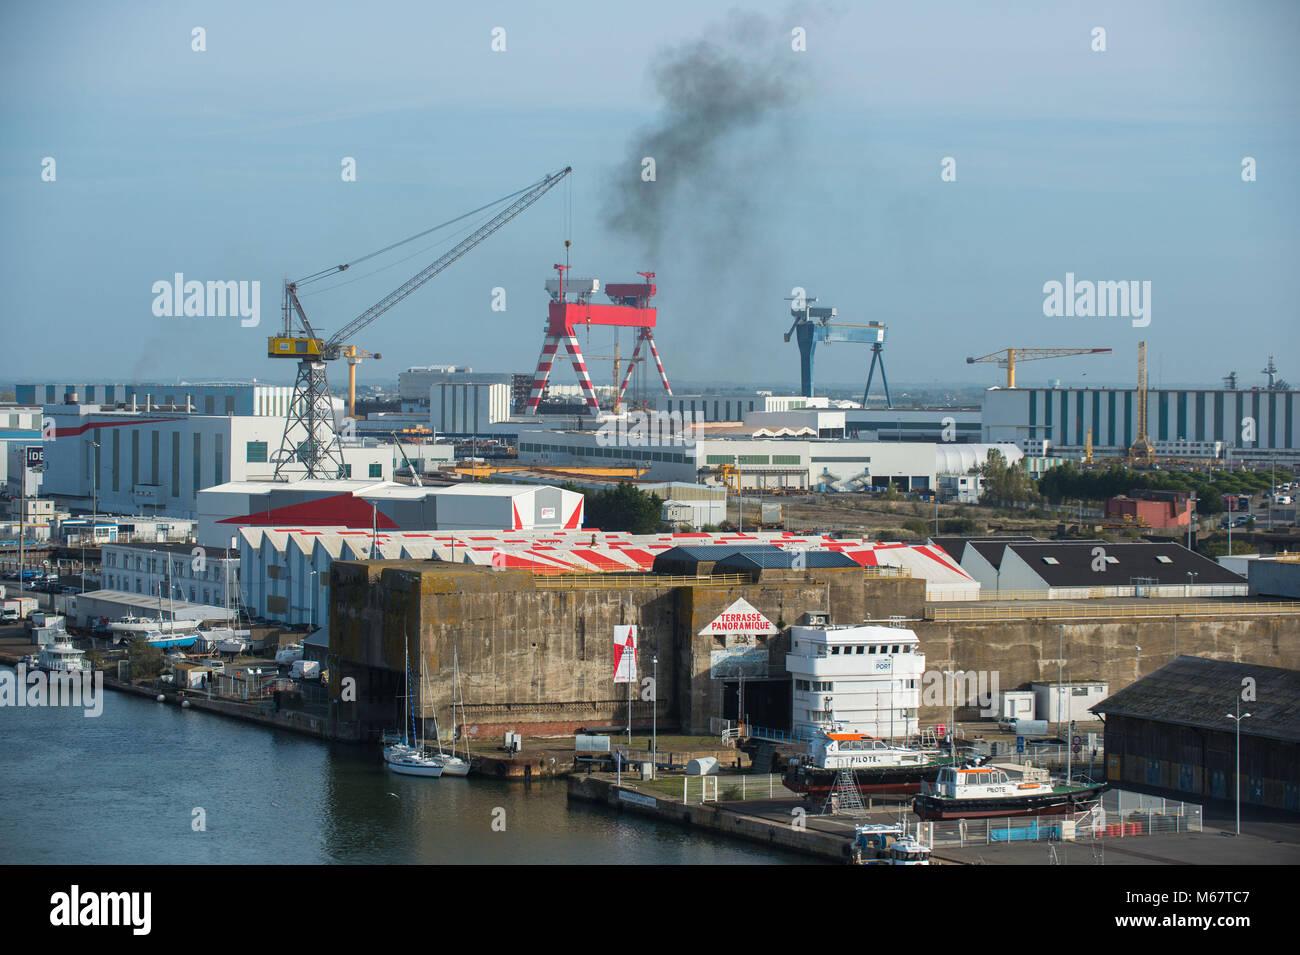 Saint Nazaire, shipyard, France. - Stock Image